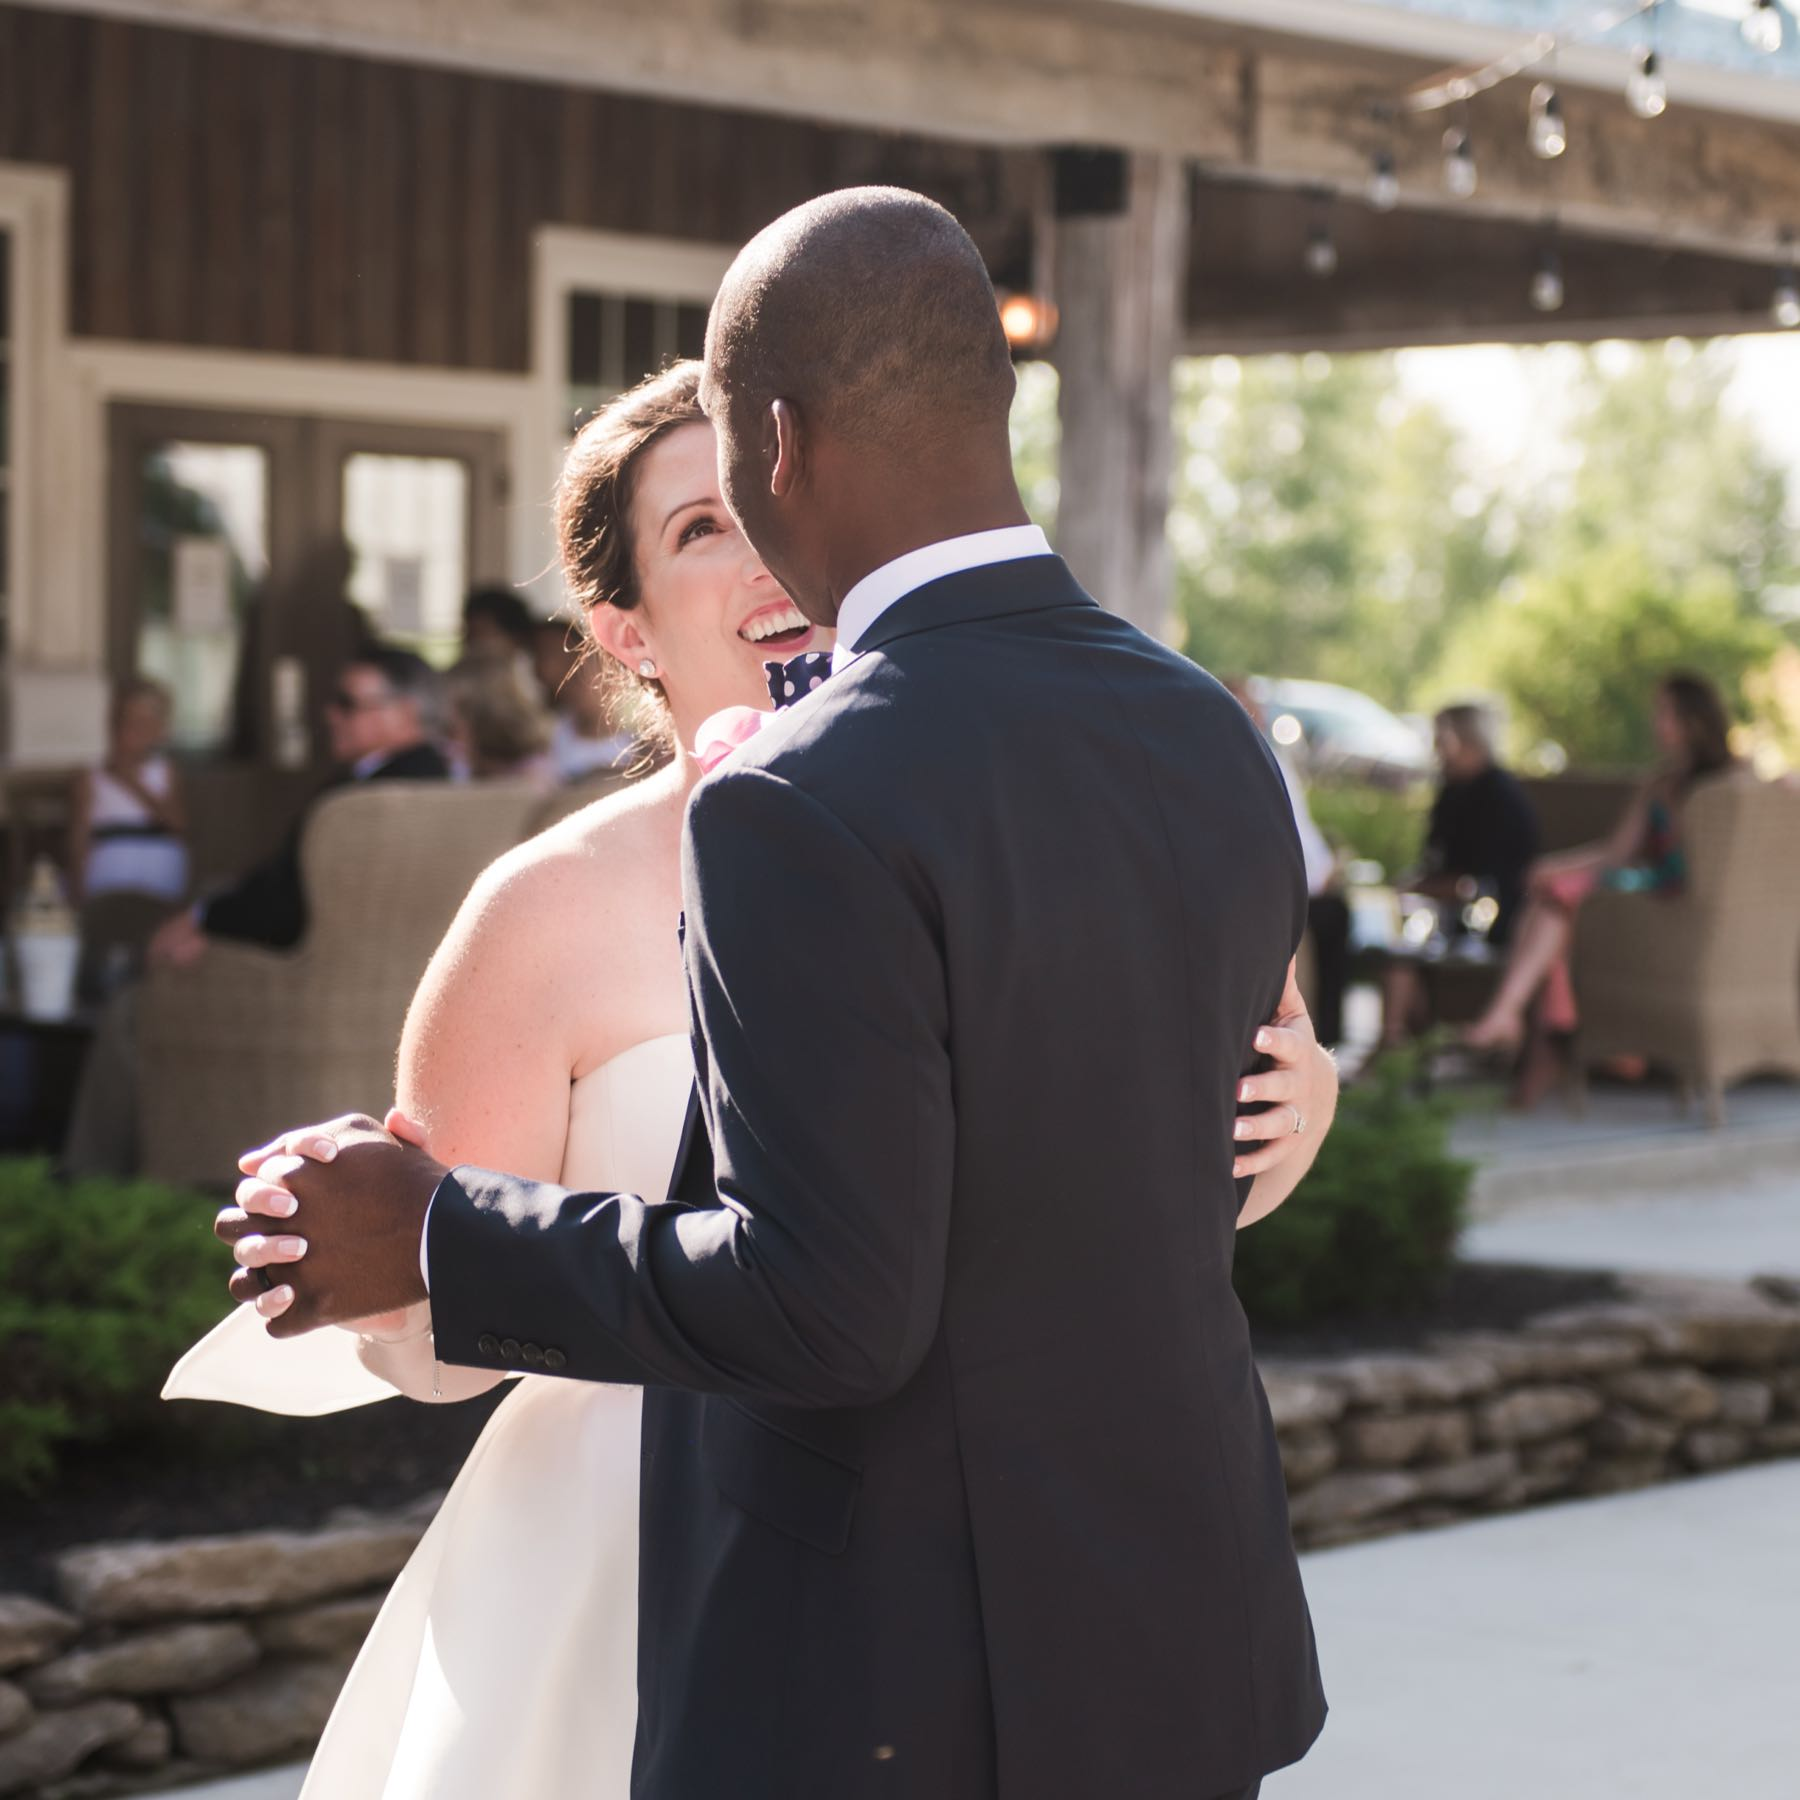 footer-wedding-image-3